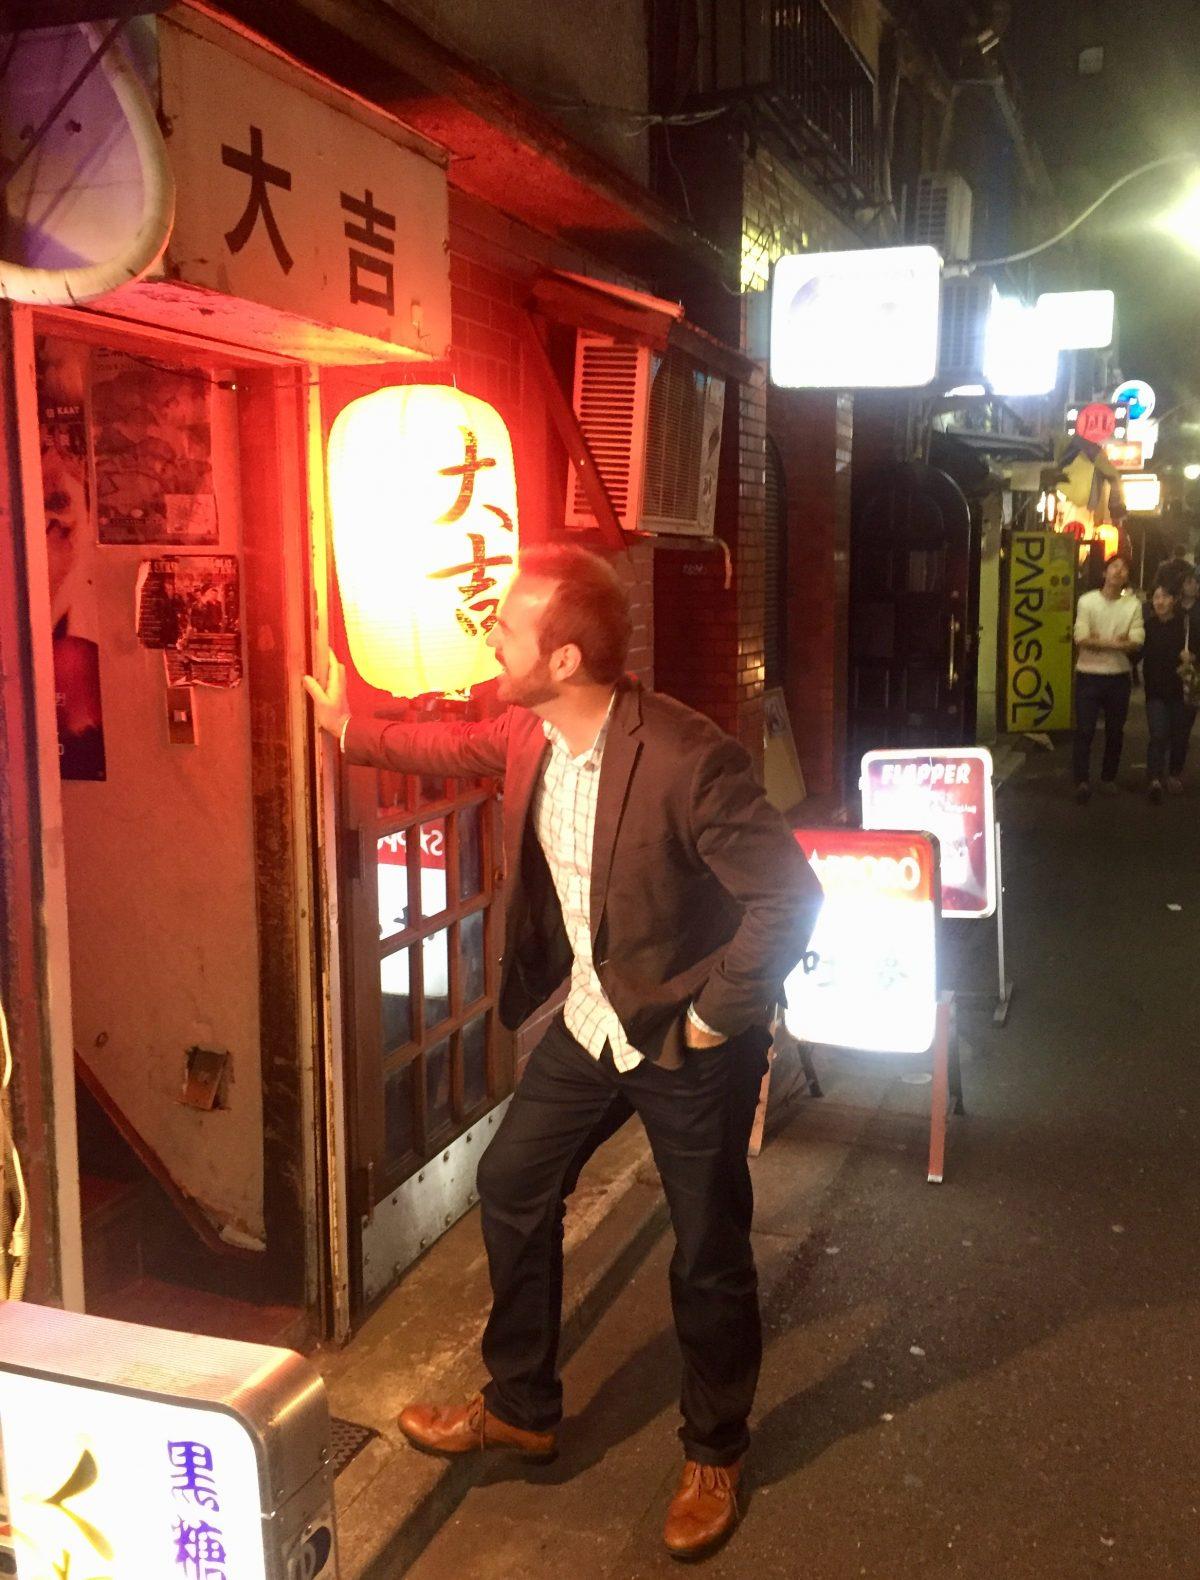 4 days in Japan